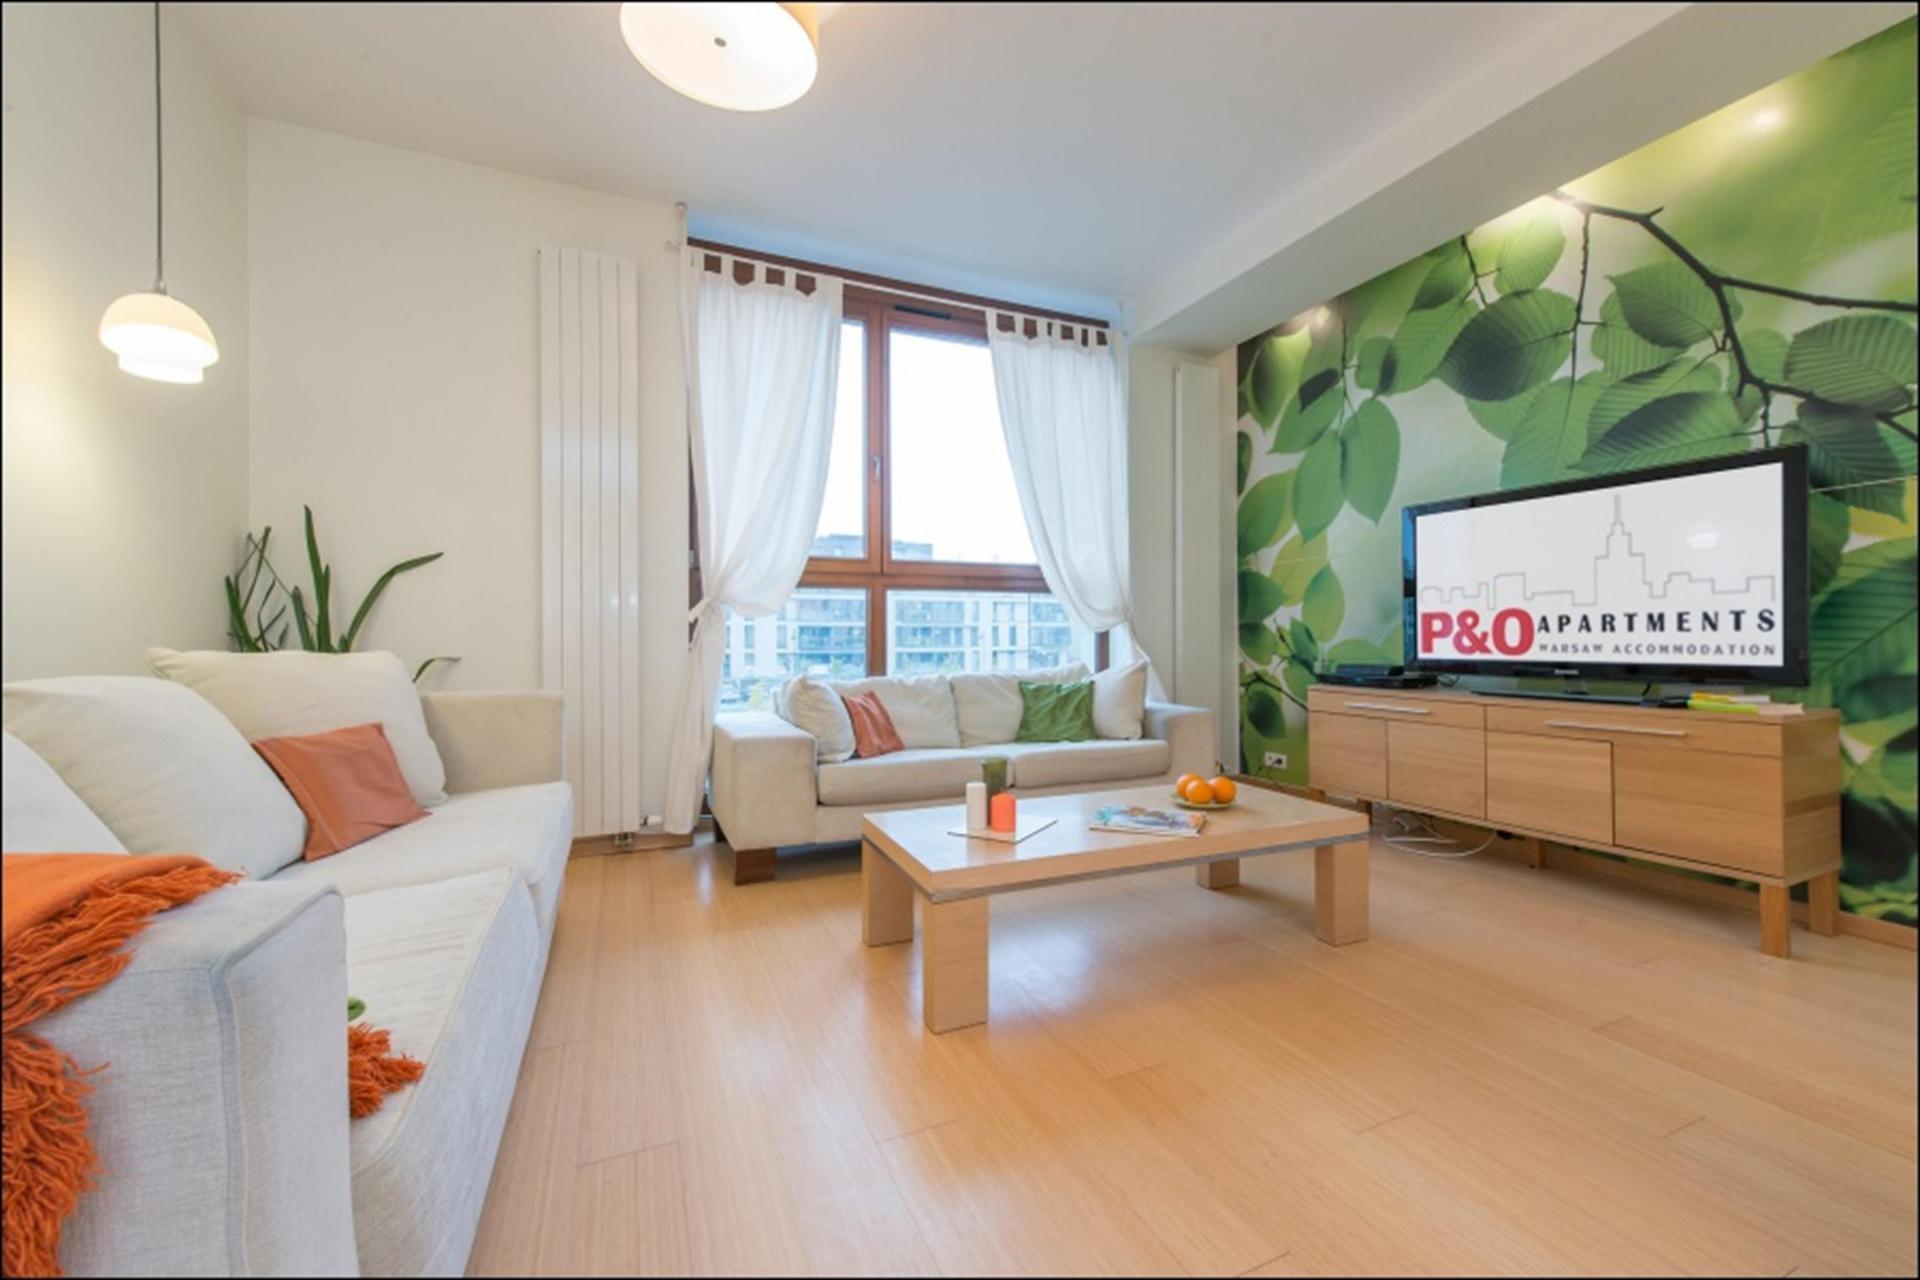 TV at Wilanow 6 Apartments, Wilanów, Warsaw - Citybase Apartments